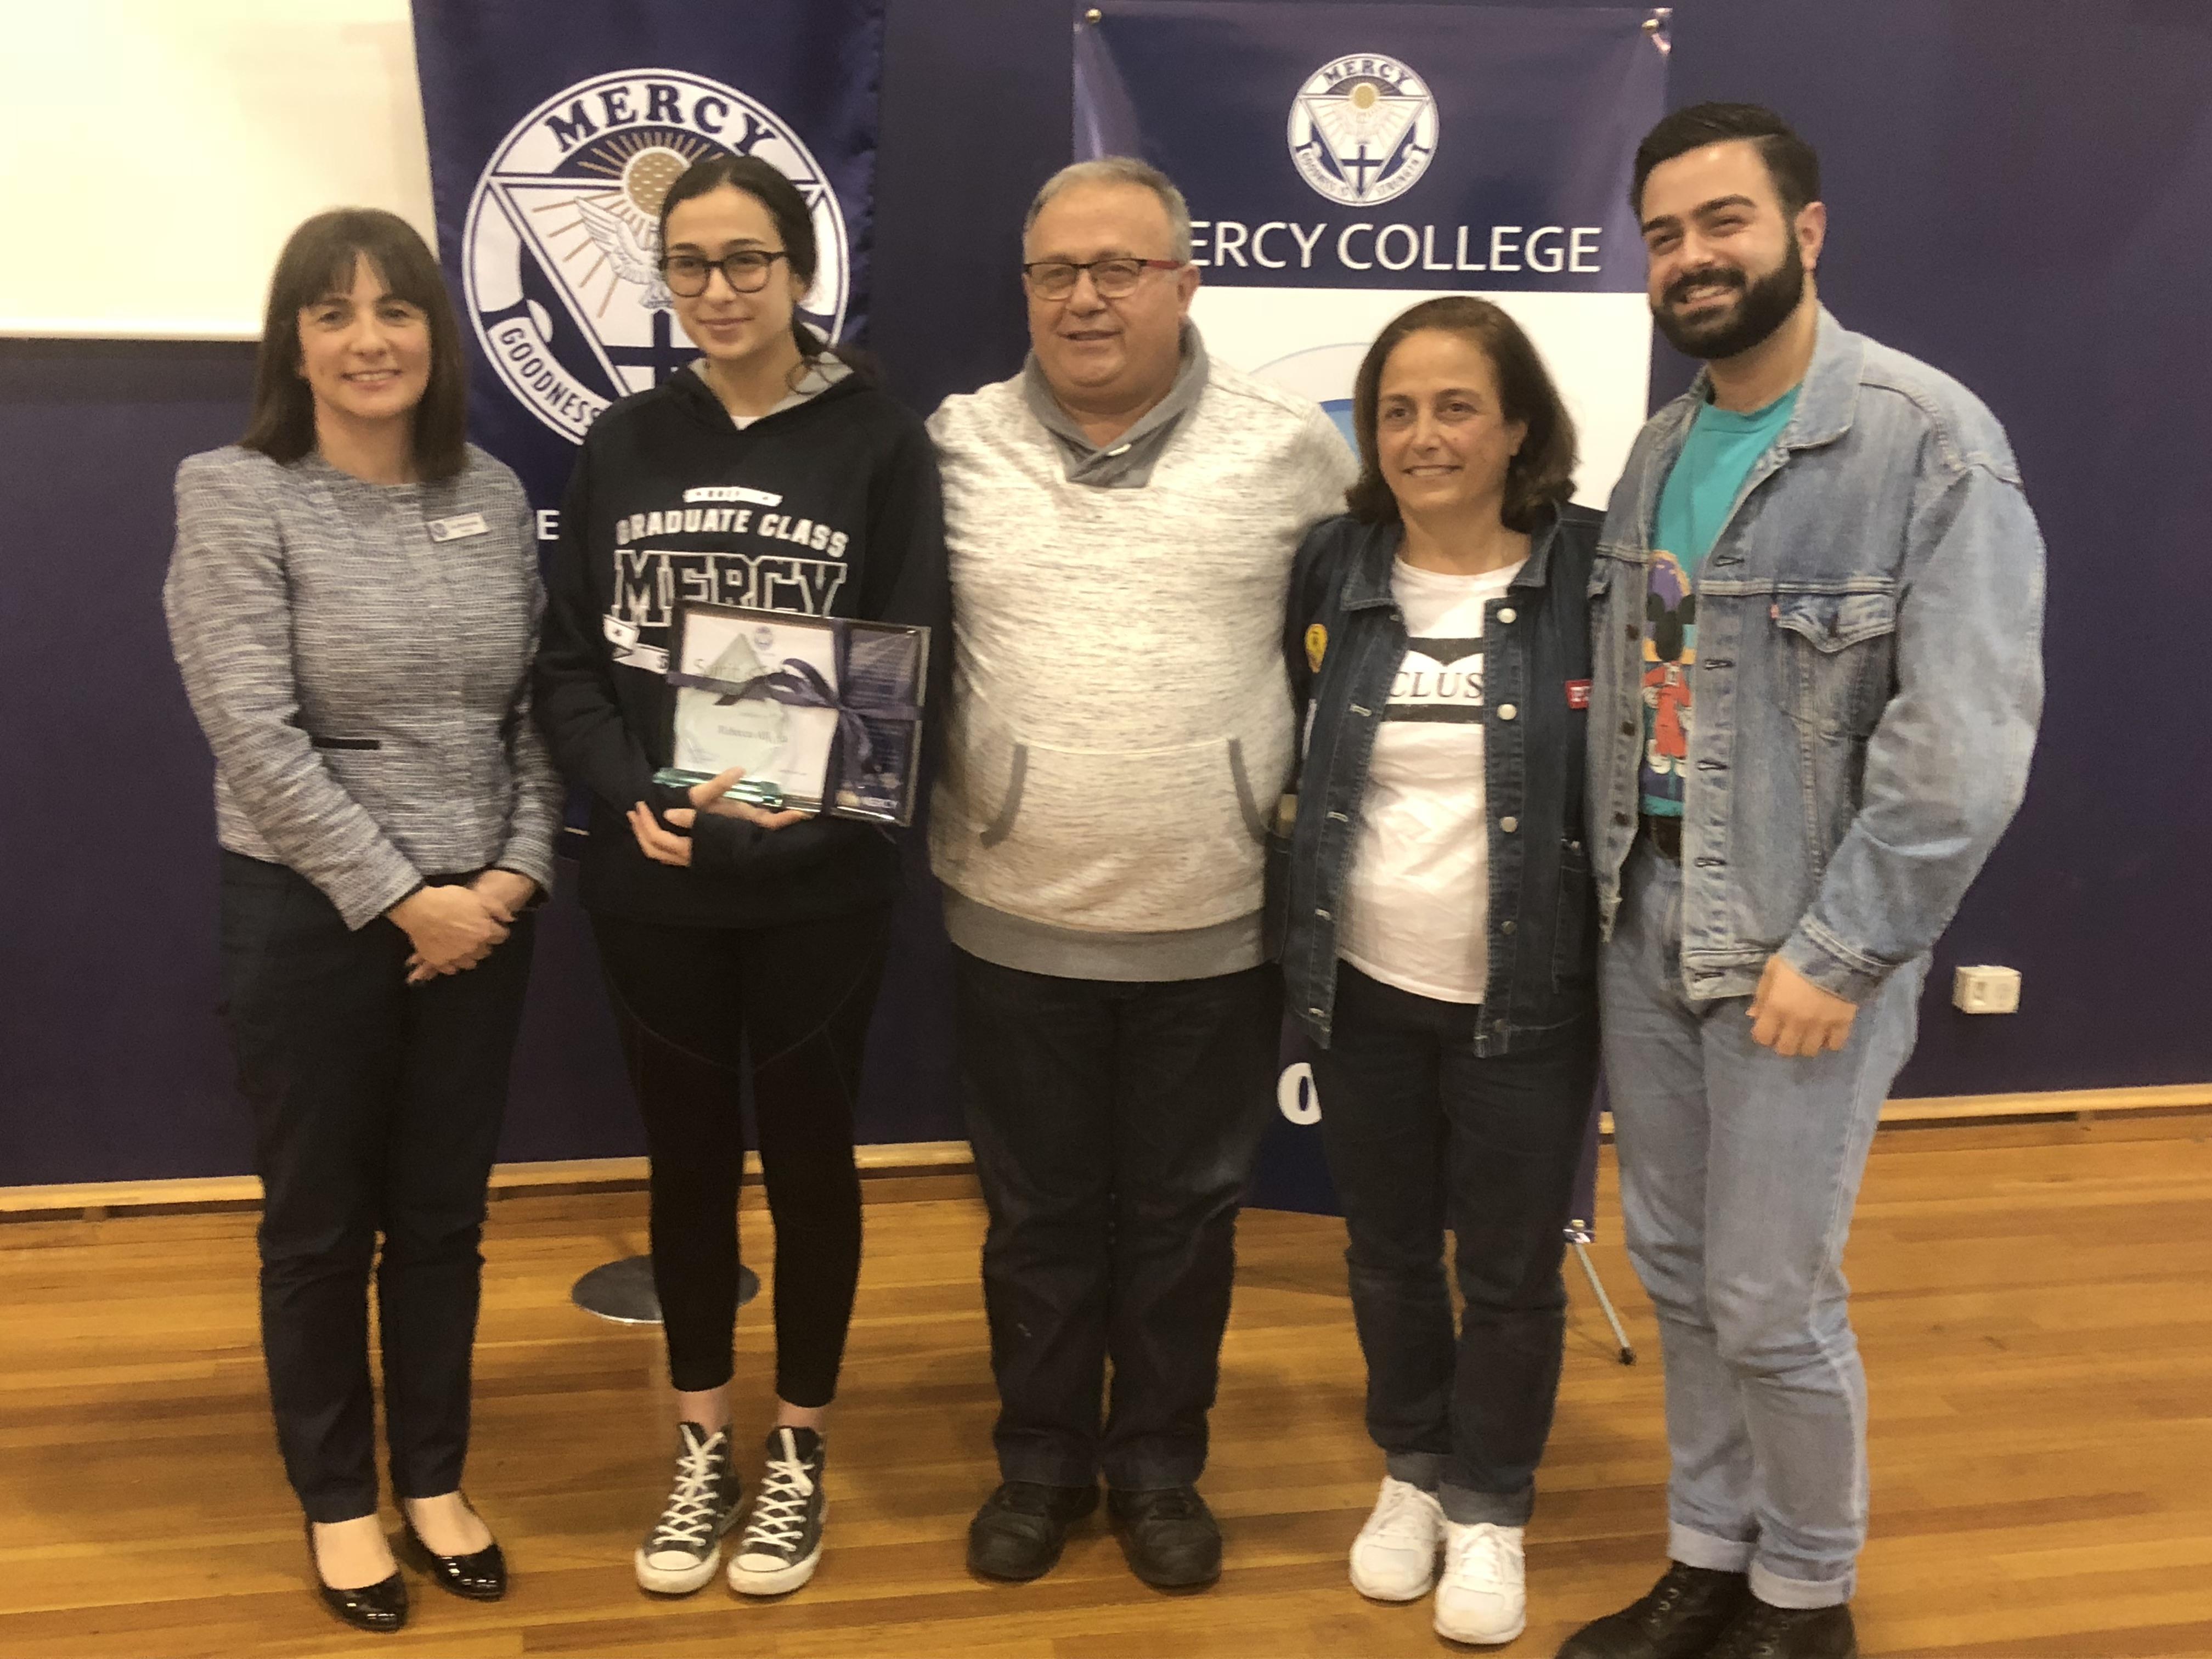 Spirit of Mercy Award 2018 - Rebecca Allaoui Year 12